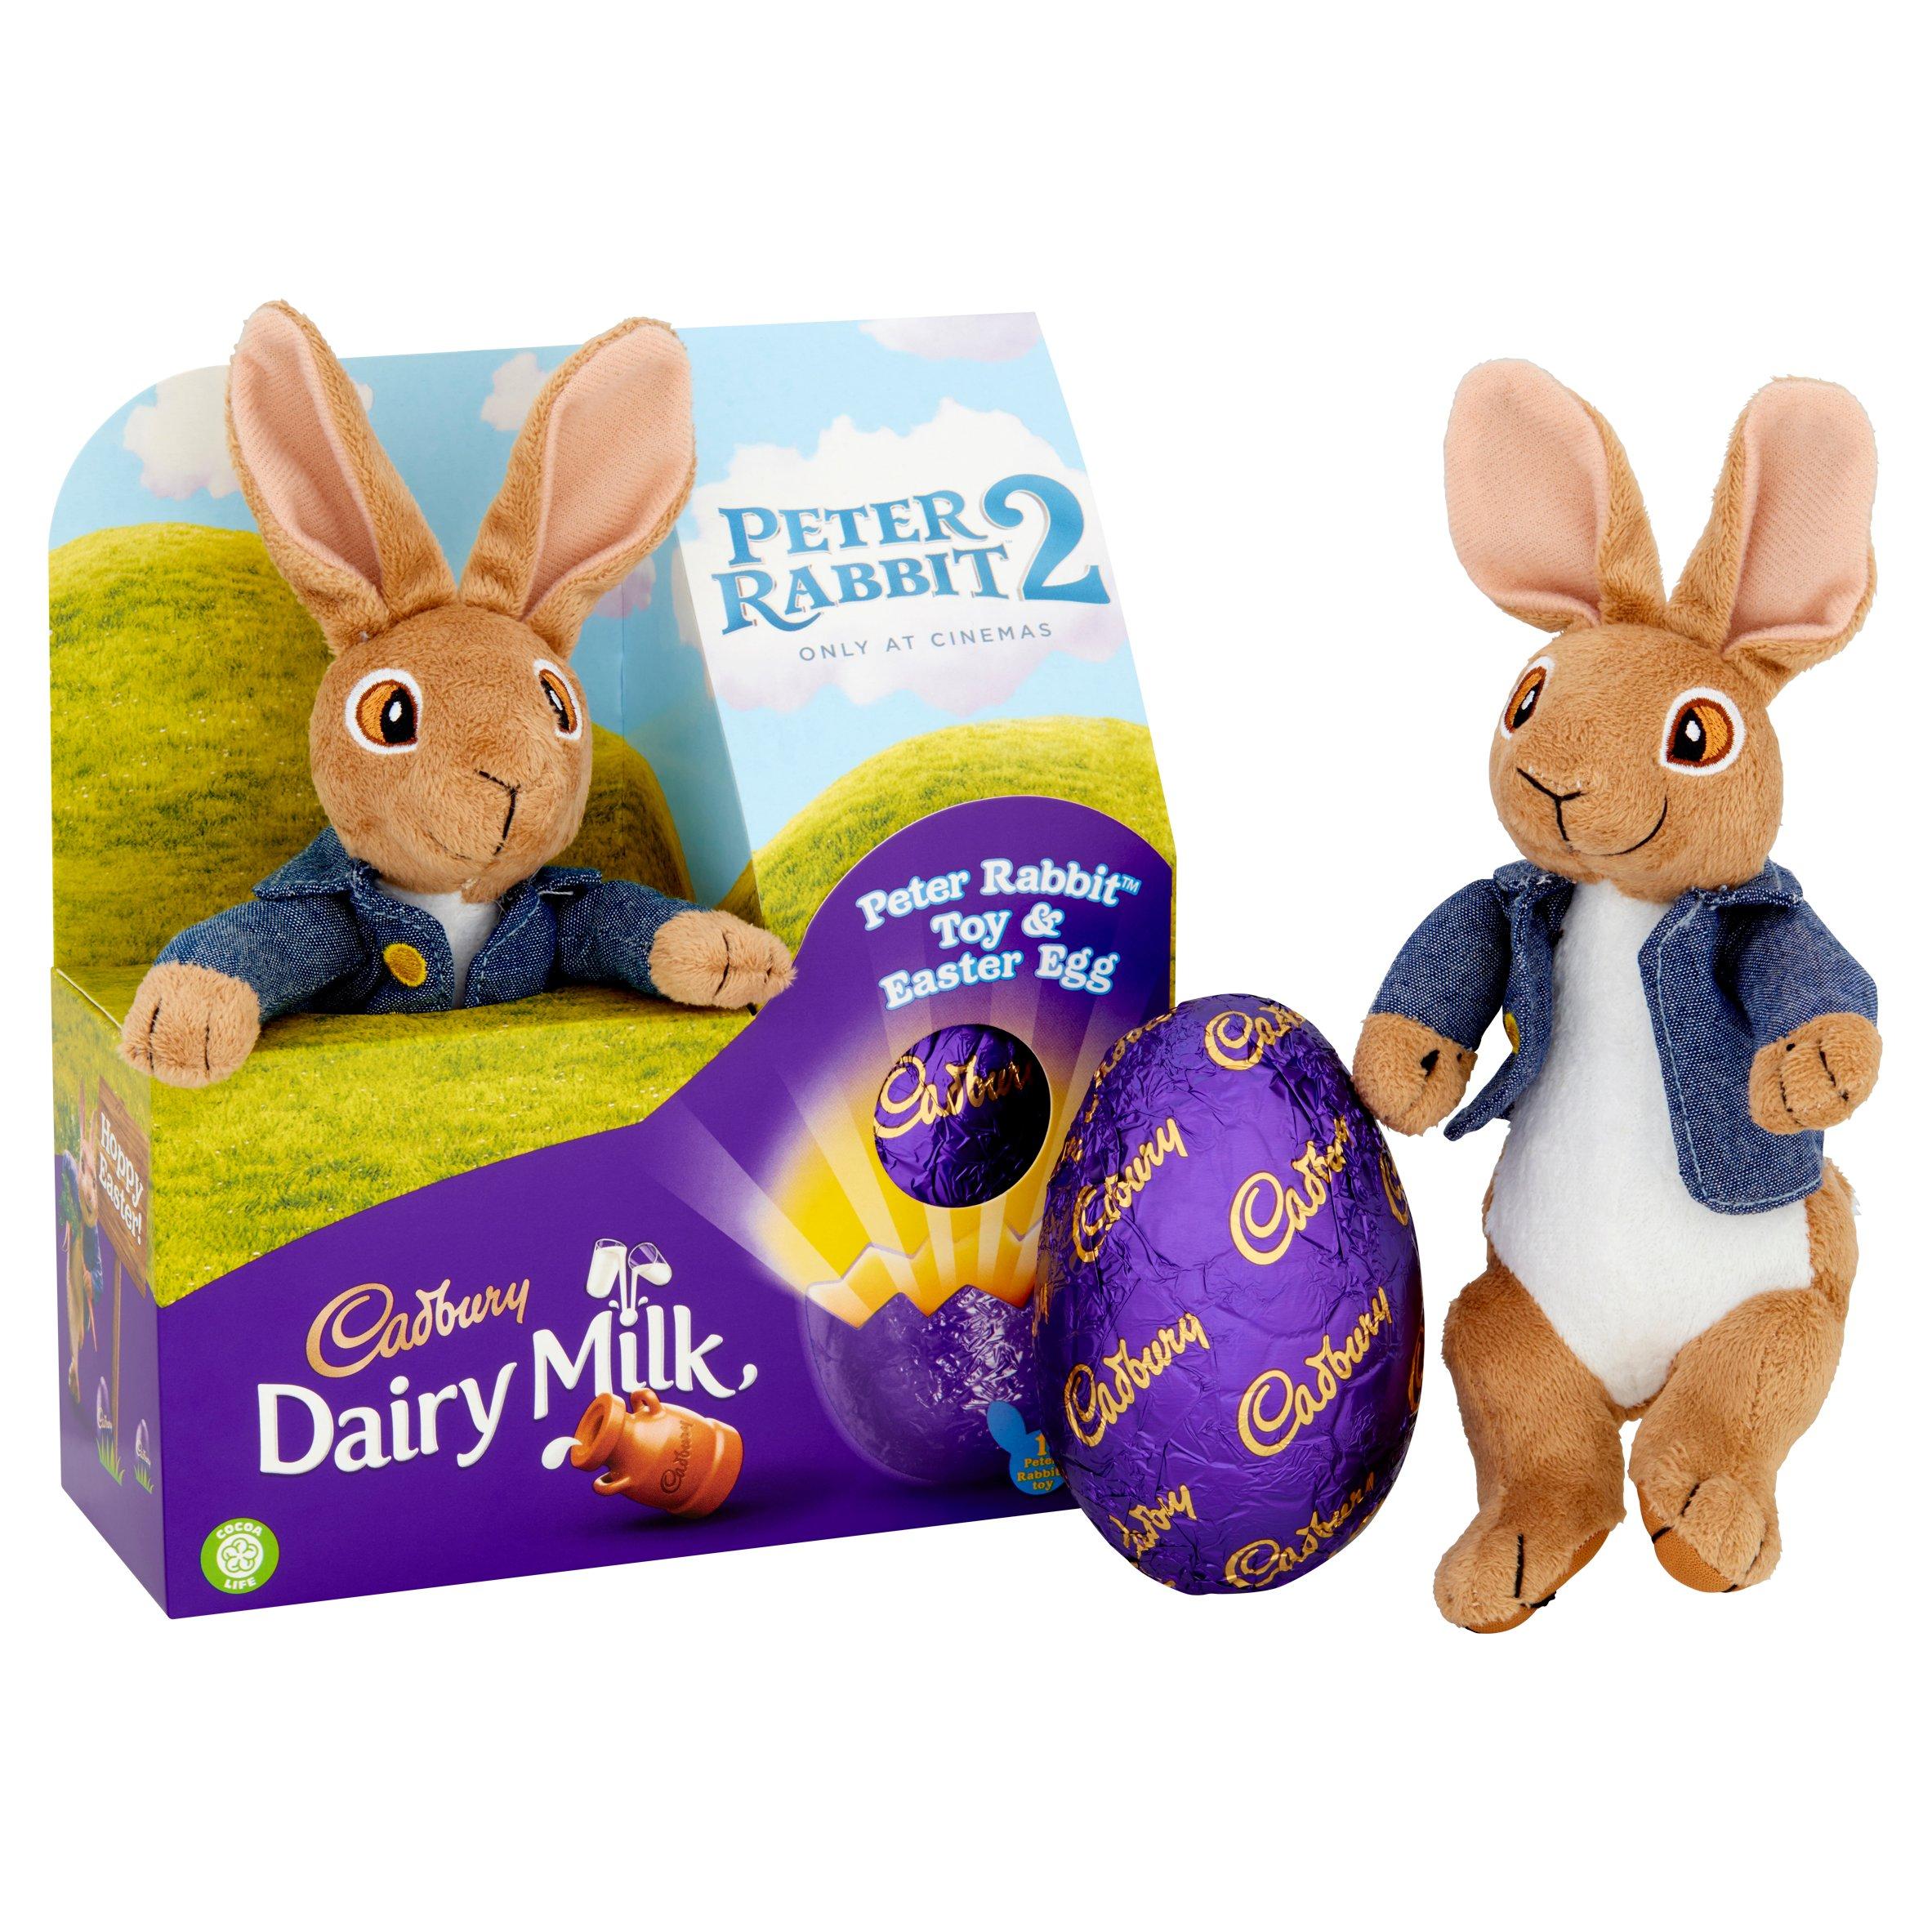 2 x Cadburys Peter Rabbit Soft Toys Plush